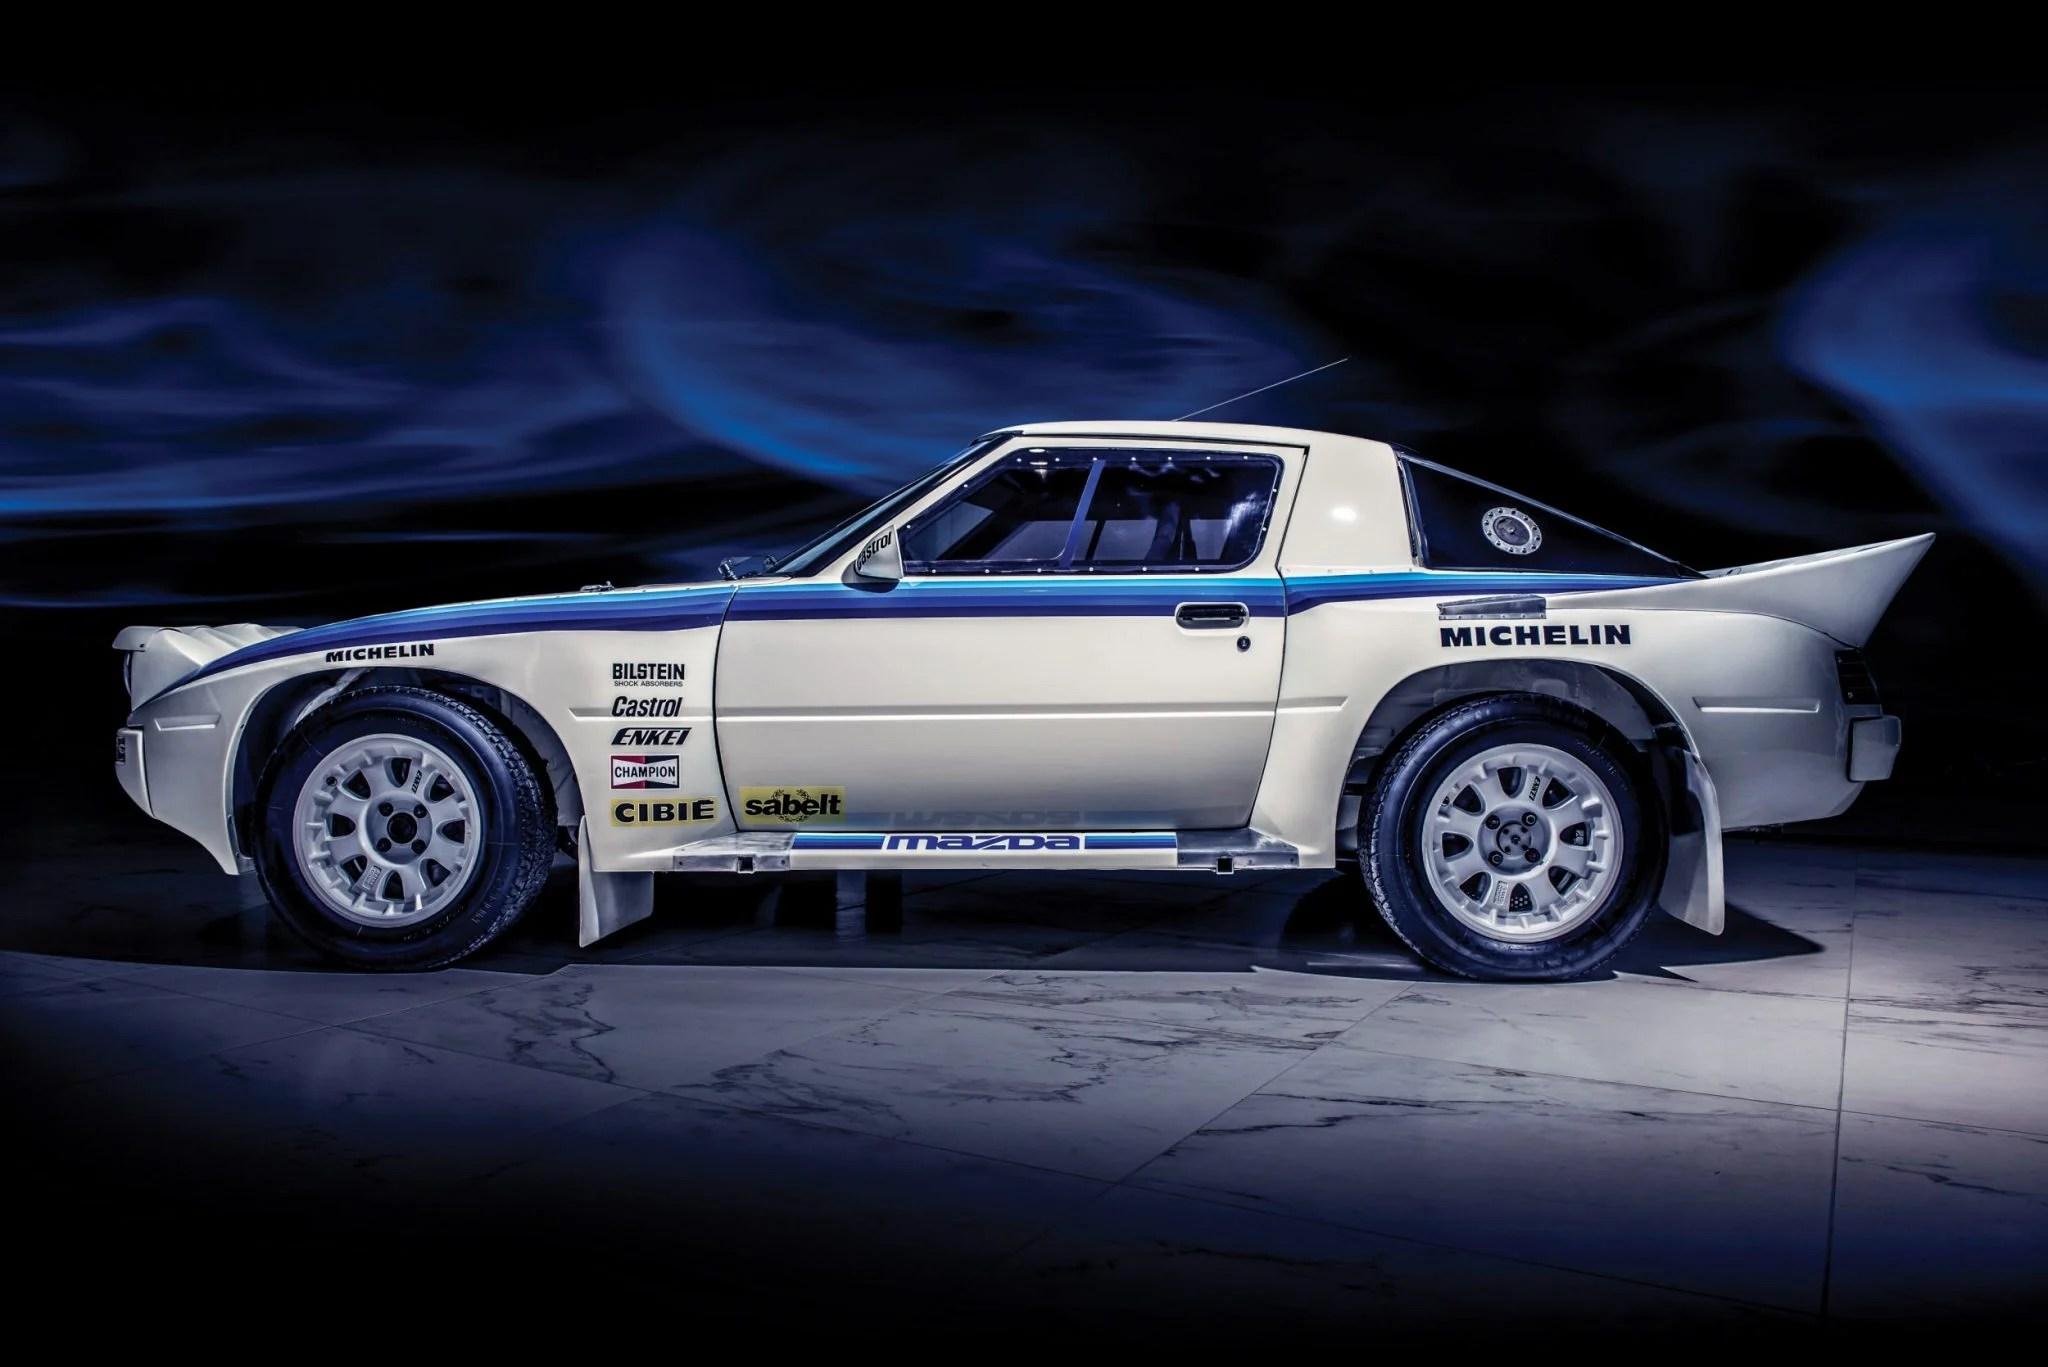 1984 Rx 7 Race Car With Bp Almost A Miata Page 18 Miata Turbo Forum